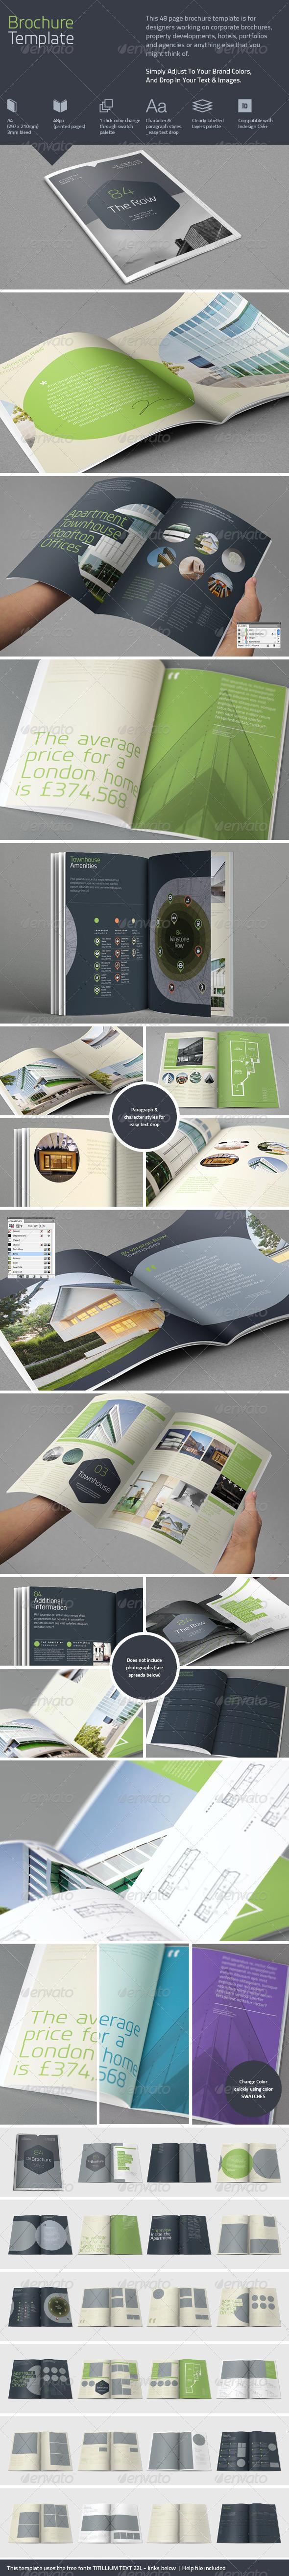 GraphicRiver Brochure Template 5172594